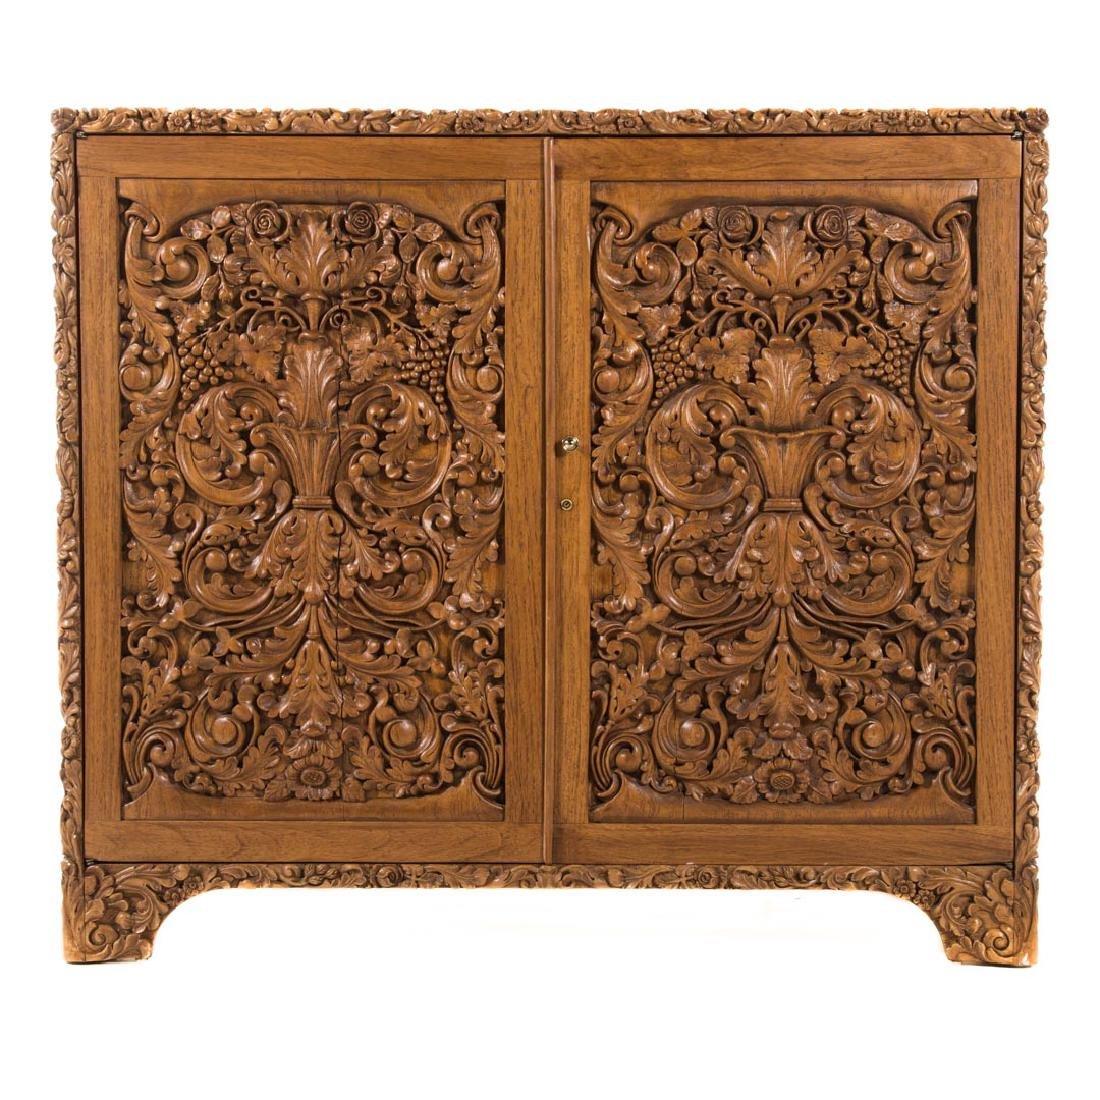 Chinese carved teakwood desk